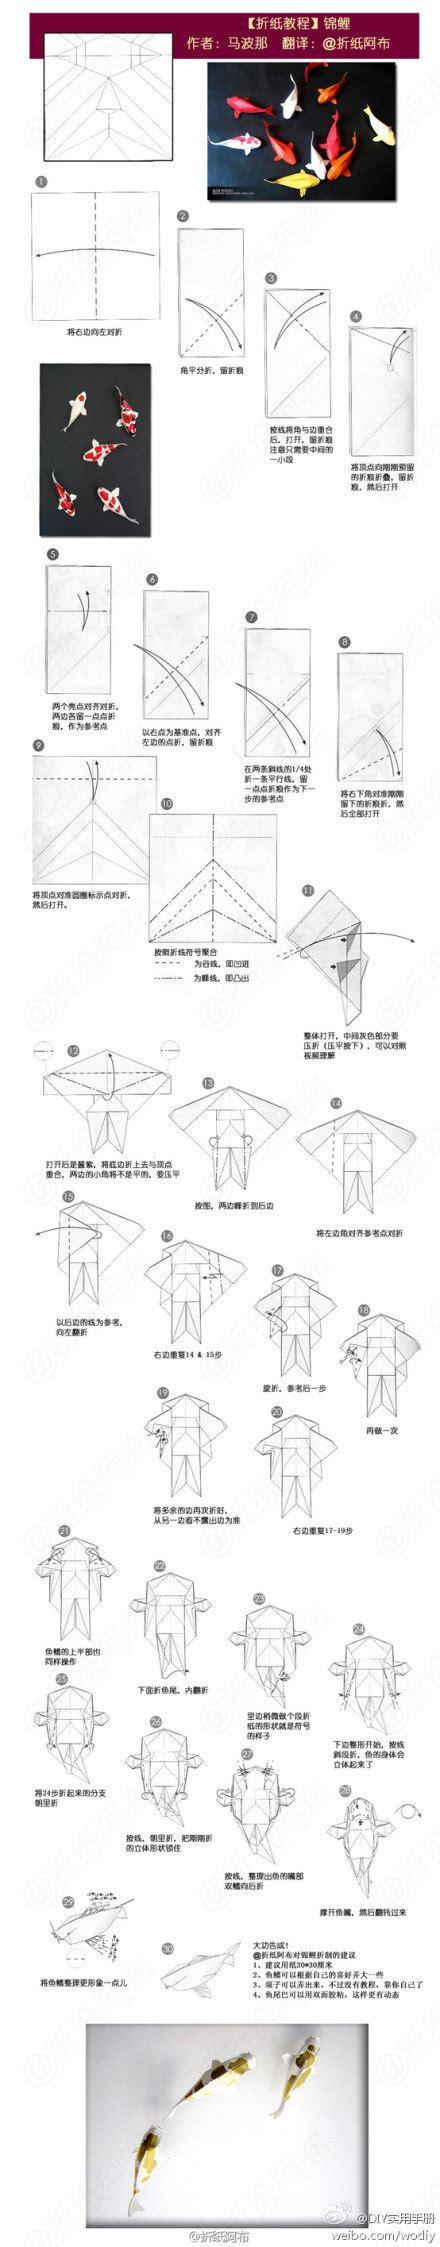 Origami Beautiful Koi Fish Folding Instructions